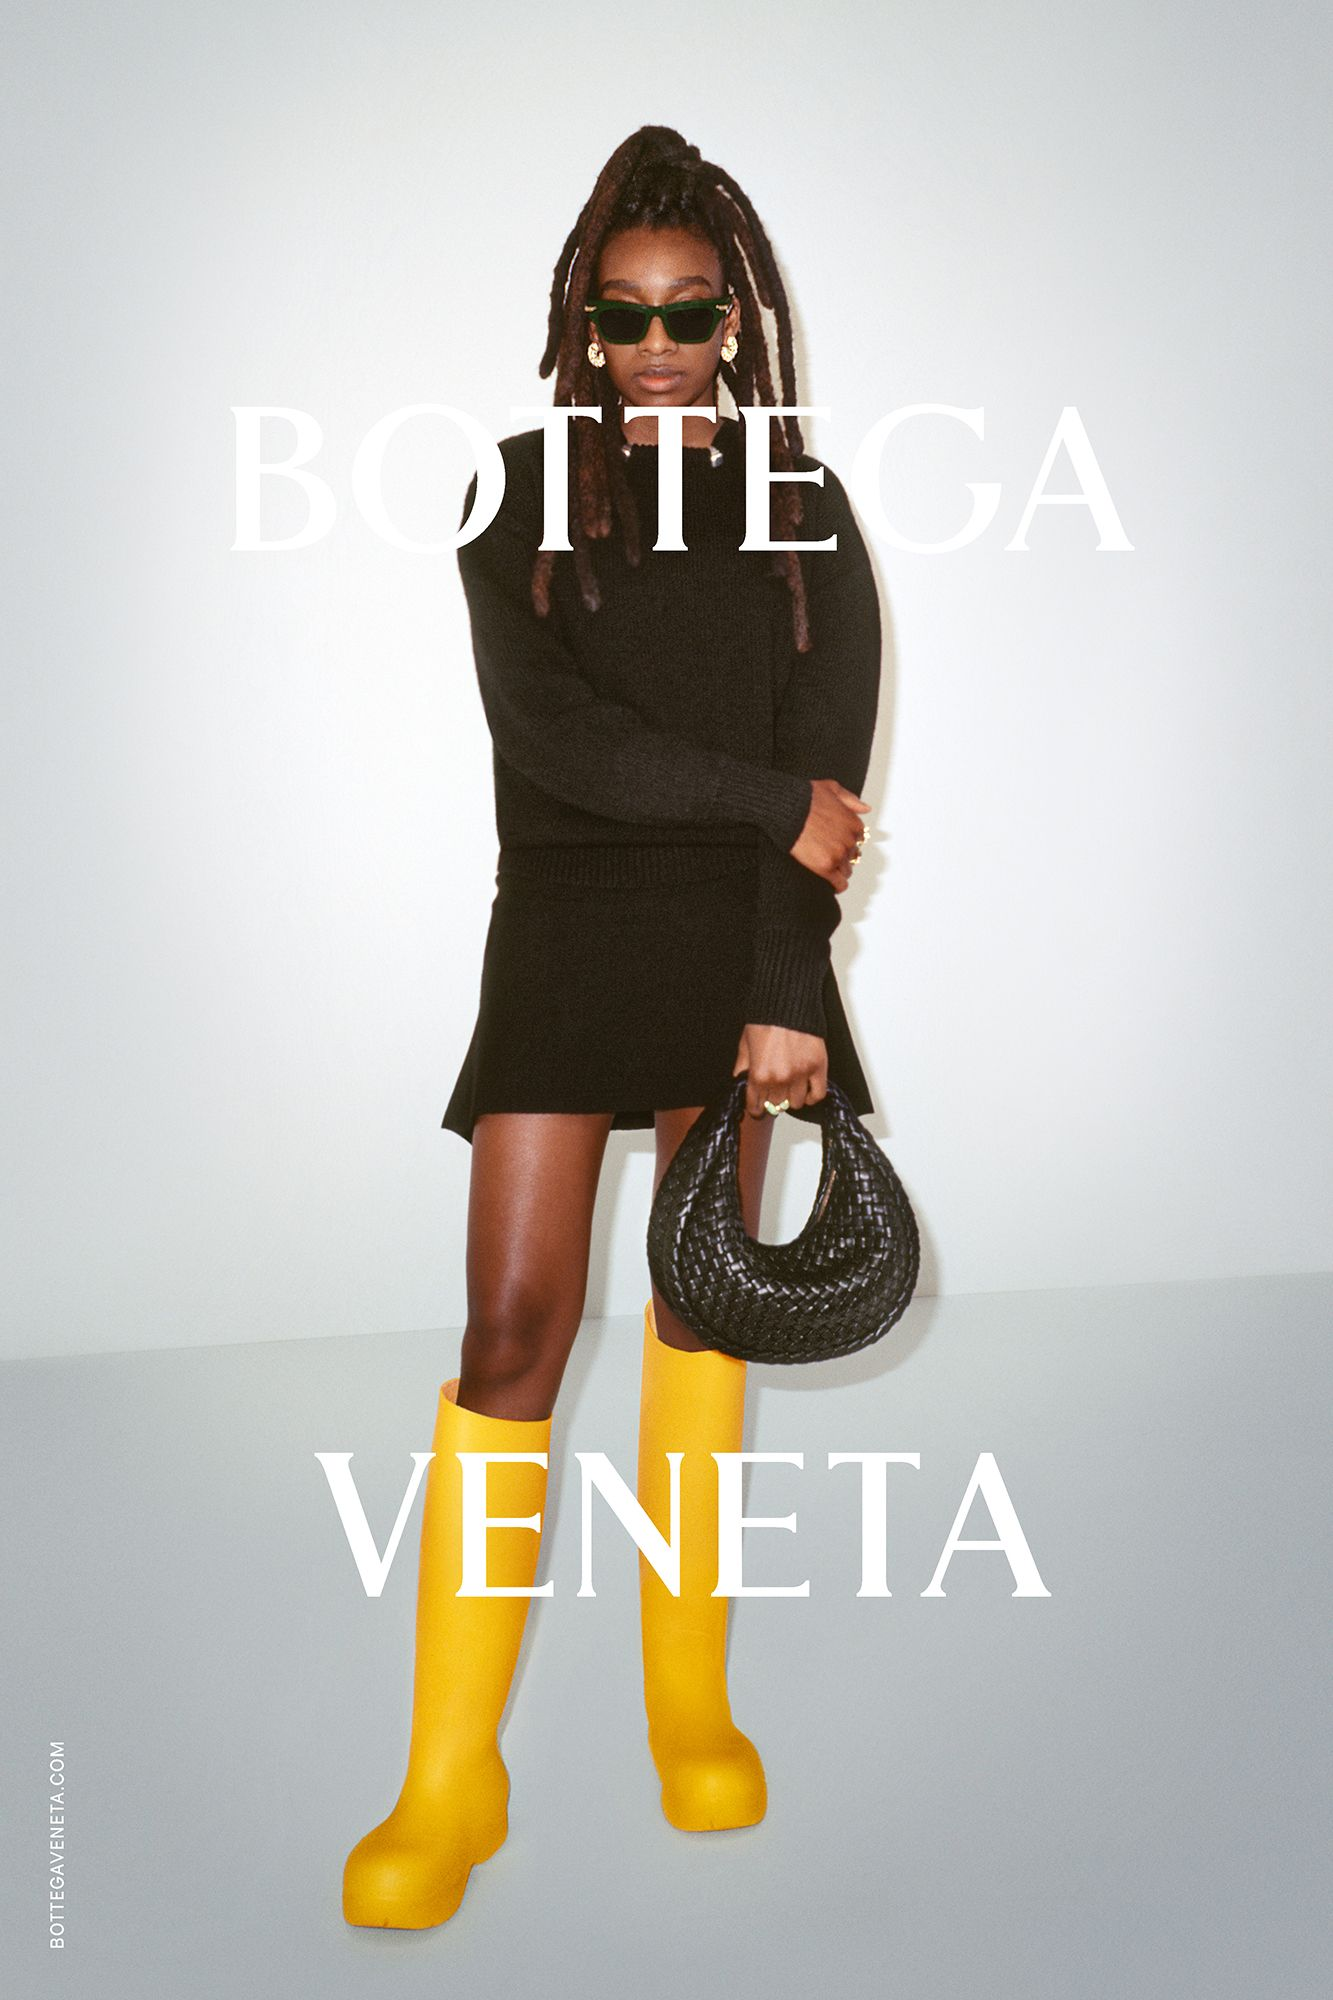 Your First Look at Bottega Veneta's Star-Studded Wardrobe 02 Campaign